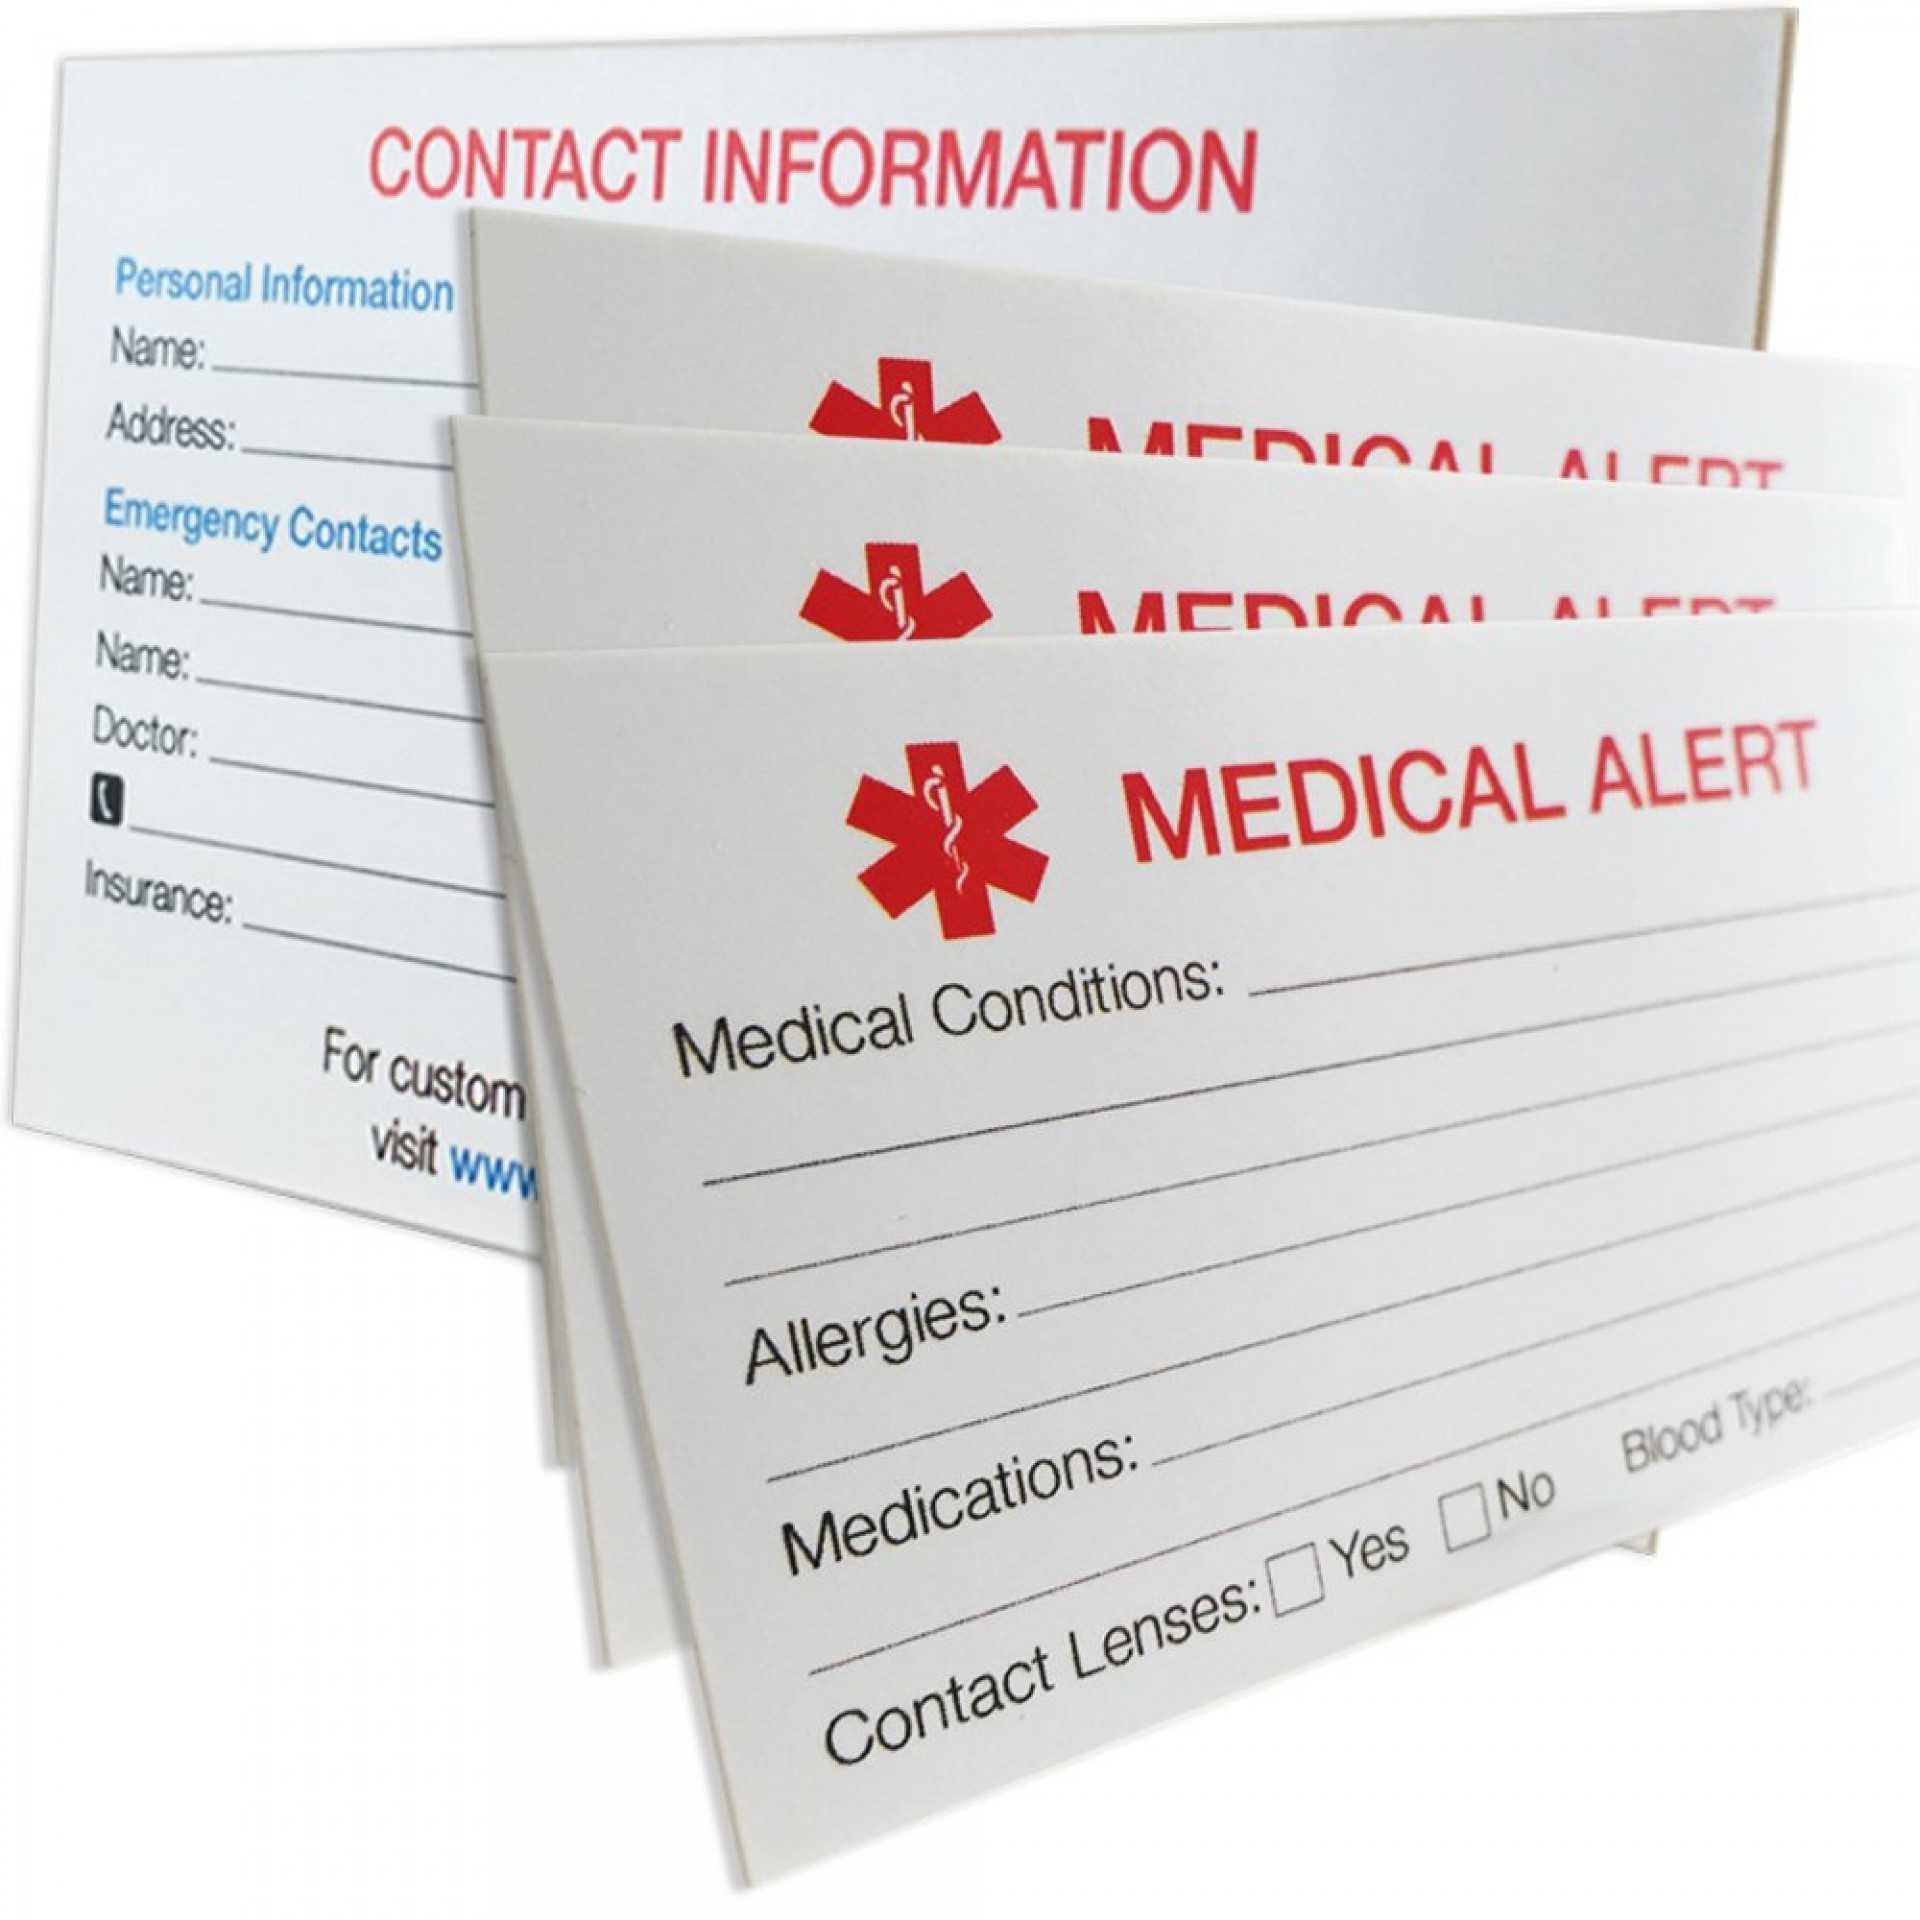 011 Template Ideas Htb1Ynxfpvxxxxauaxxxq6Xxfxxxo Medical With Regard To Medical Alert Wallet Card Template